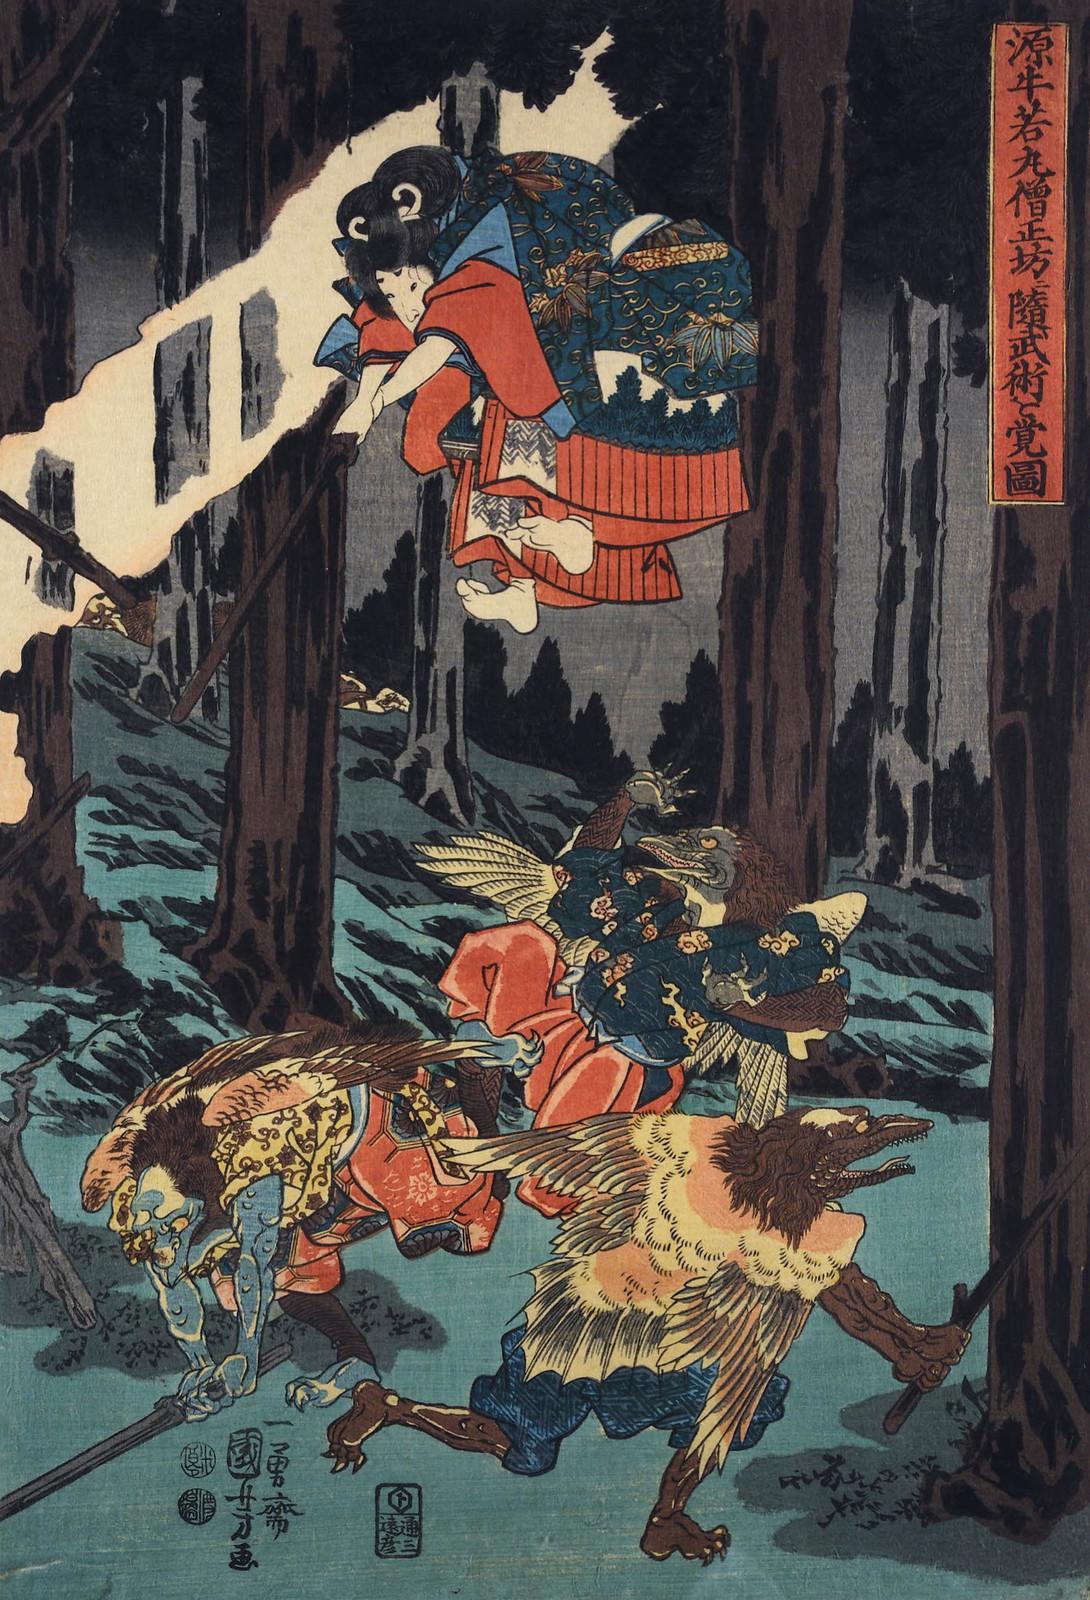 Utagawa Kuniyoshi - Sojobo, King of the Tengu, and Yoshitsune leaping in the air, 1847-52 (right panel)